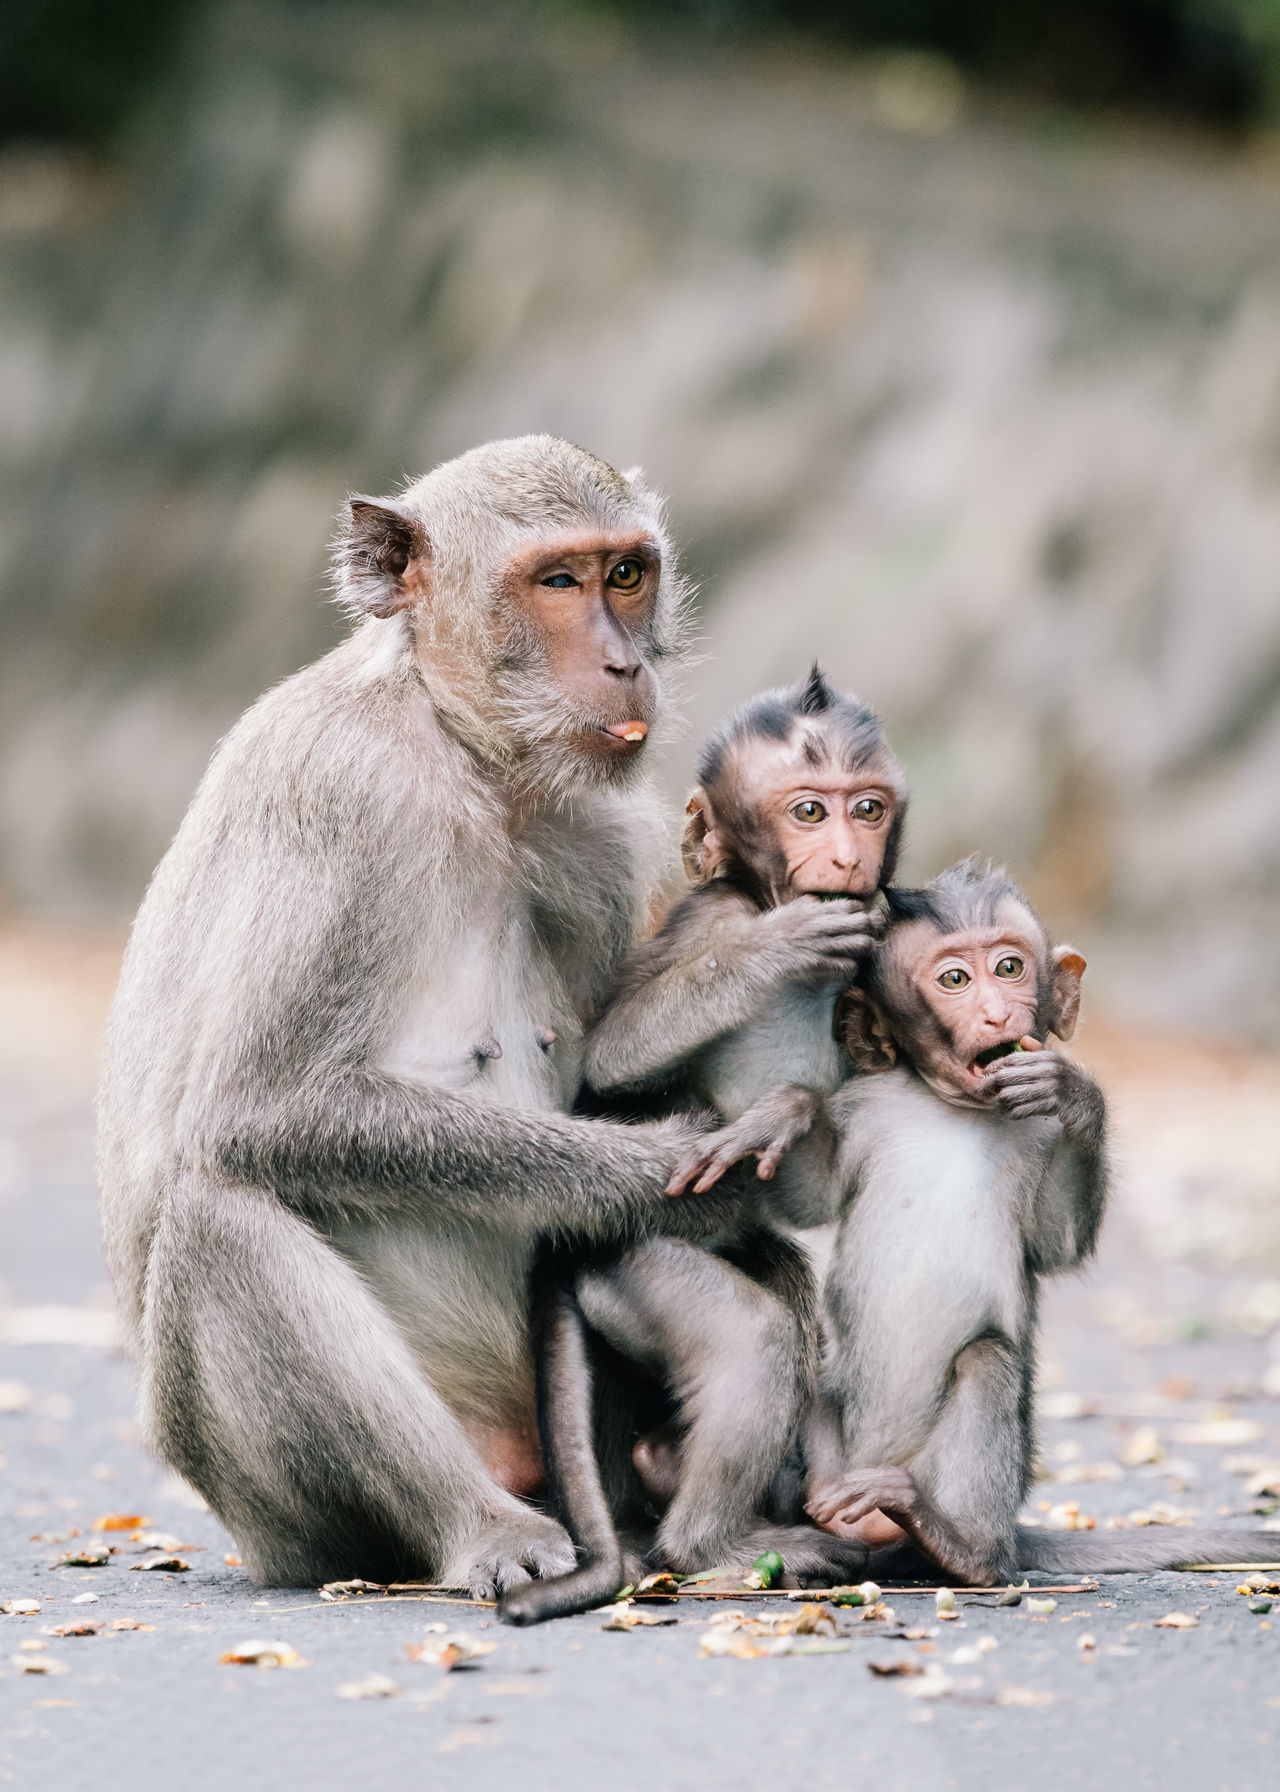 monkey, primate, group of animals, animal, animal themes